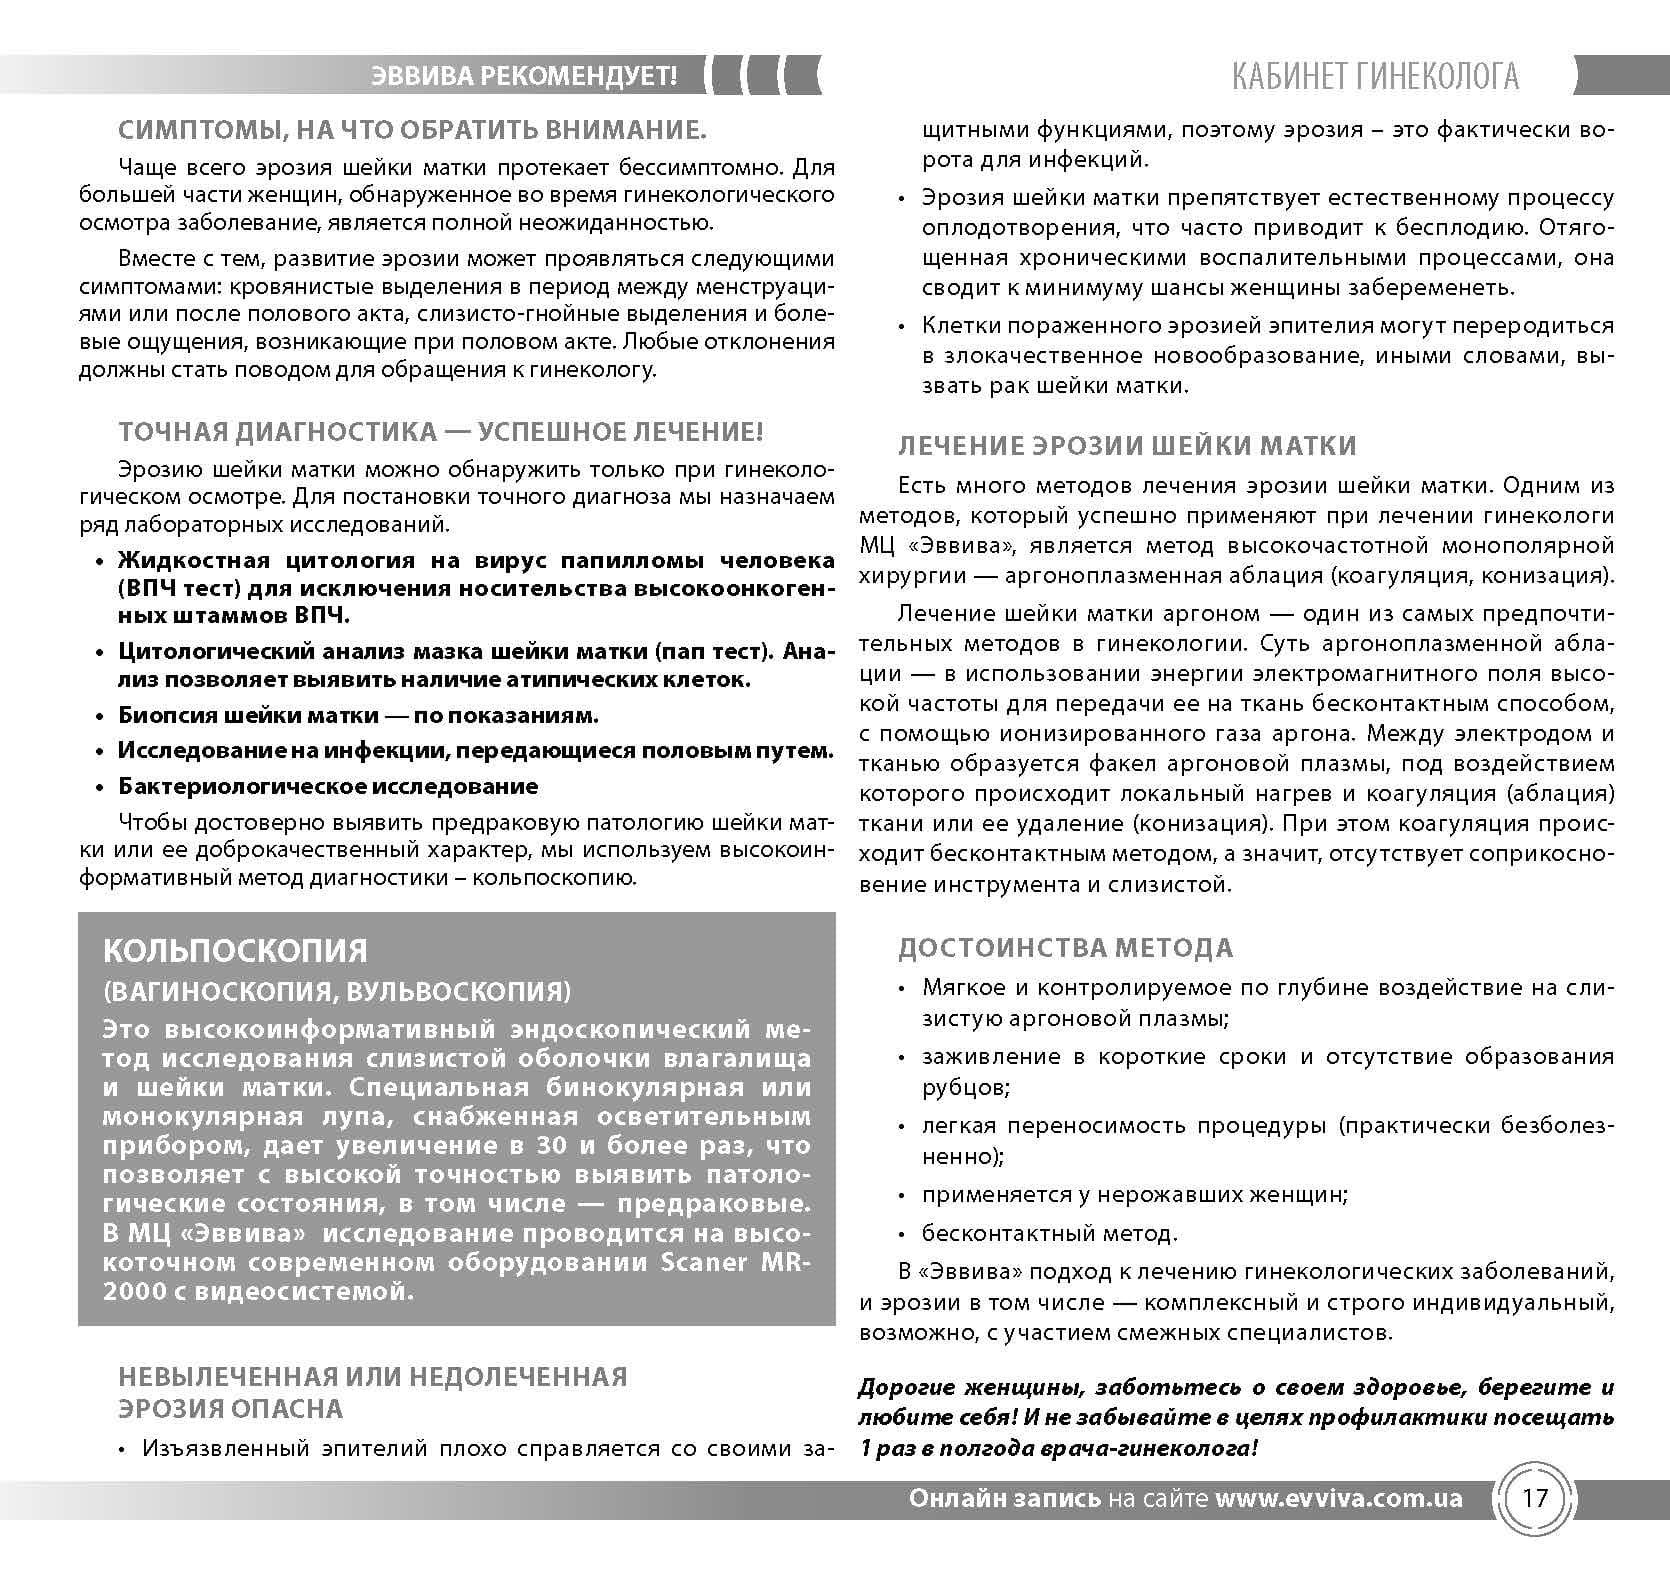 evviva-zhurnal-119-page17